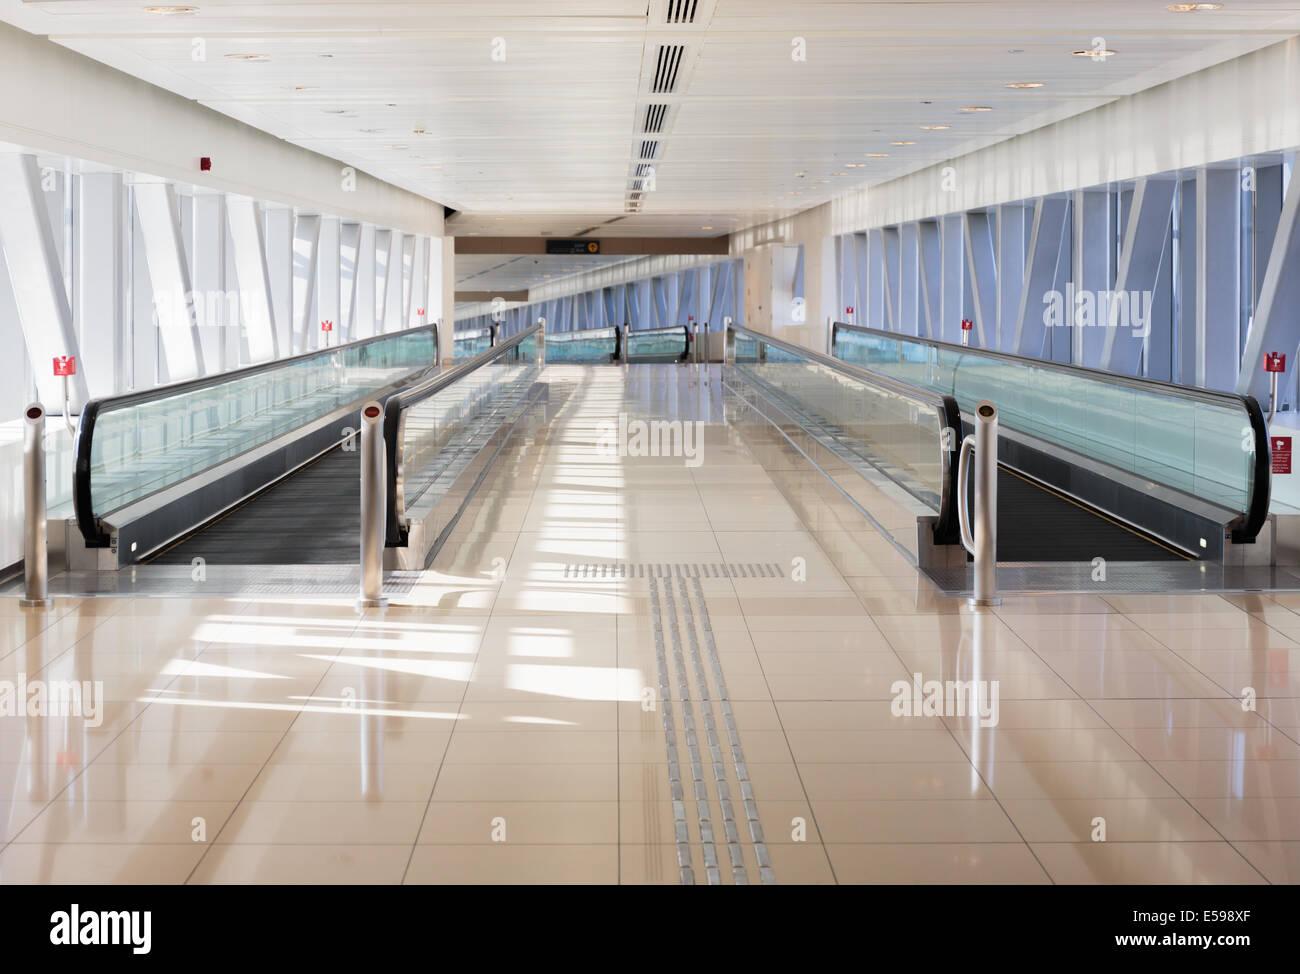 DUBAI, EMIRATOS ÁRABES UNIDOS - Octubre 31: Interior de la estación de metro de Dubai. Metro más largo del mundo, red de metro totalmente automatizado (75 km) en O Foto de stock